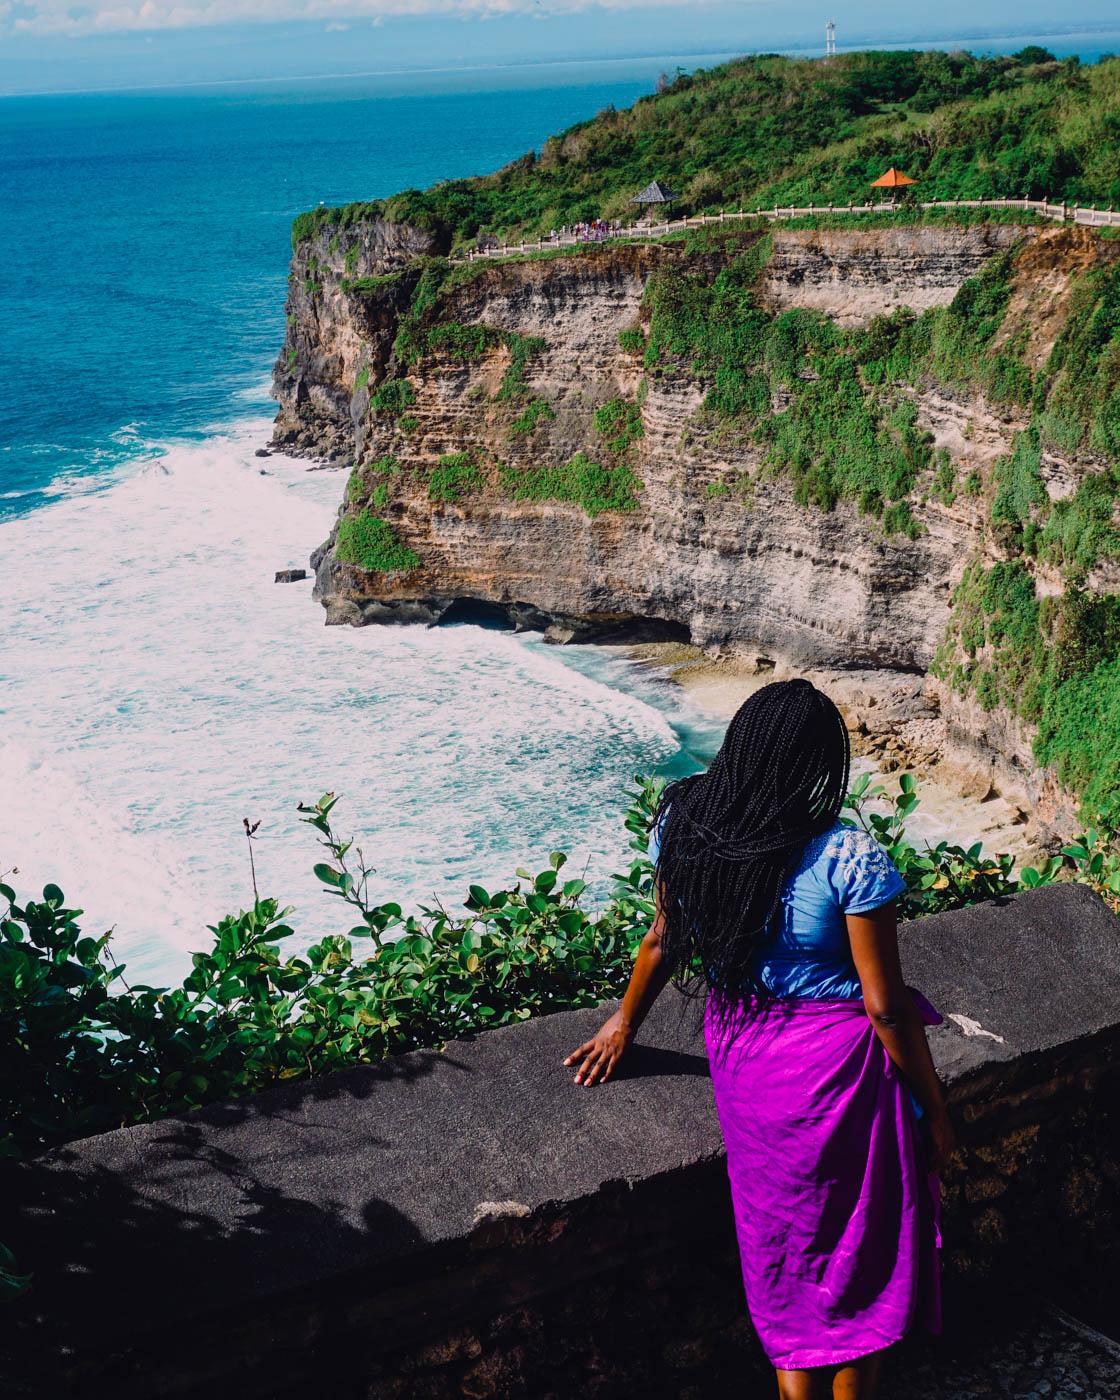 The Bali Rainy Season Guide I Bali Travel I Winter Sun I Indonesia I Travel #traveldestinations #traveltips #bali #indonesia-6